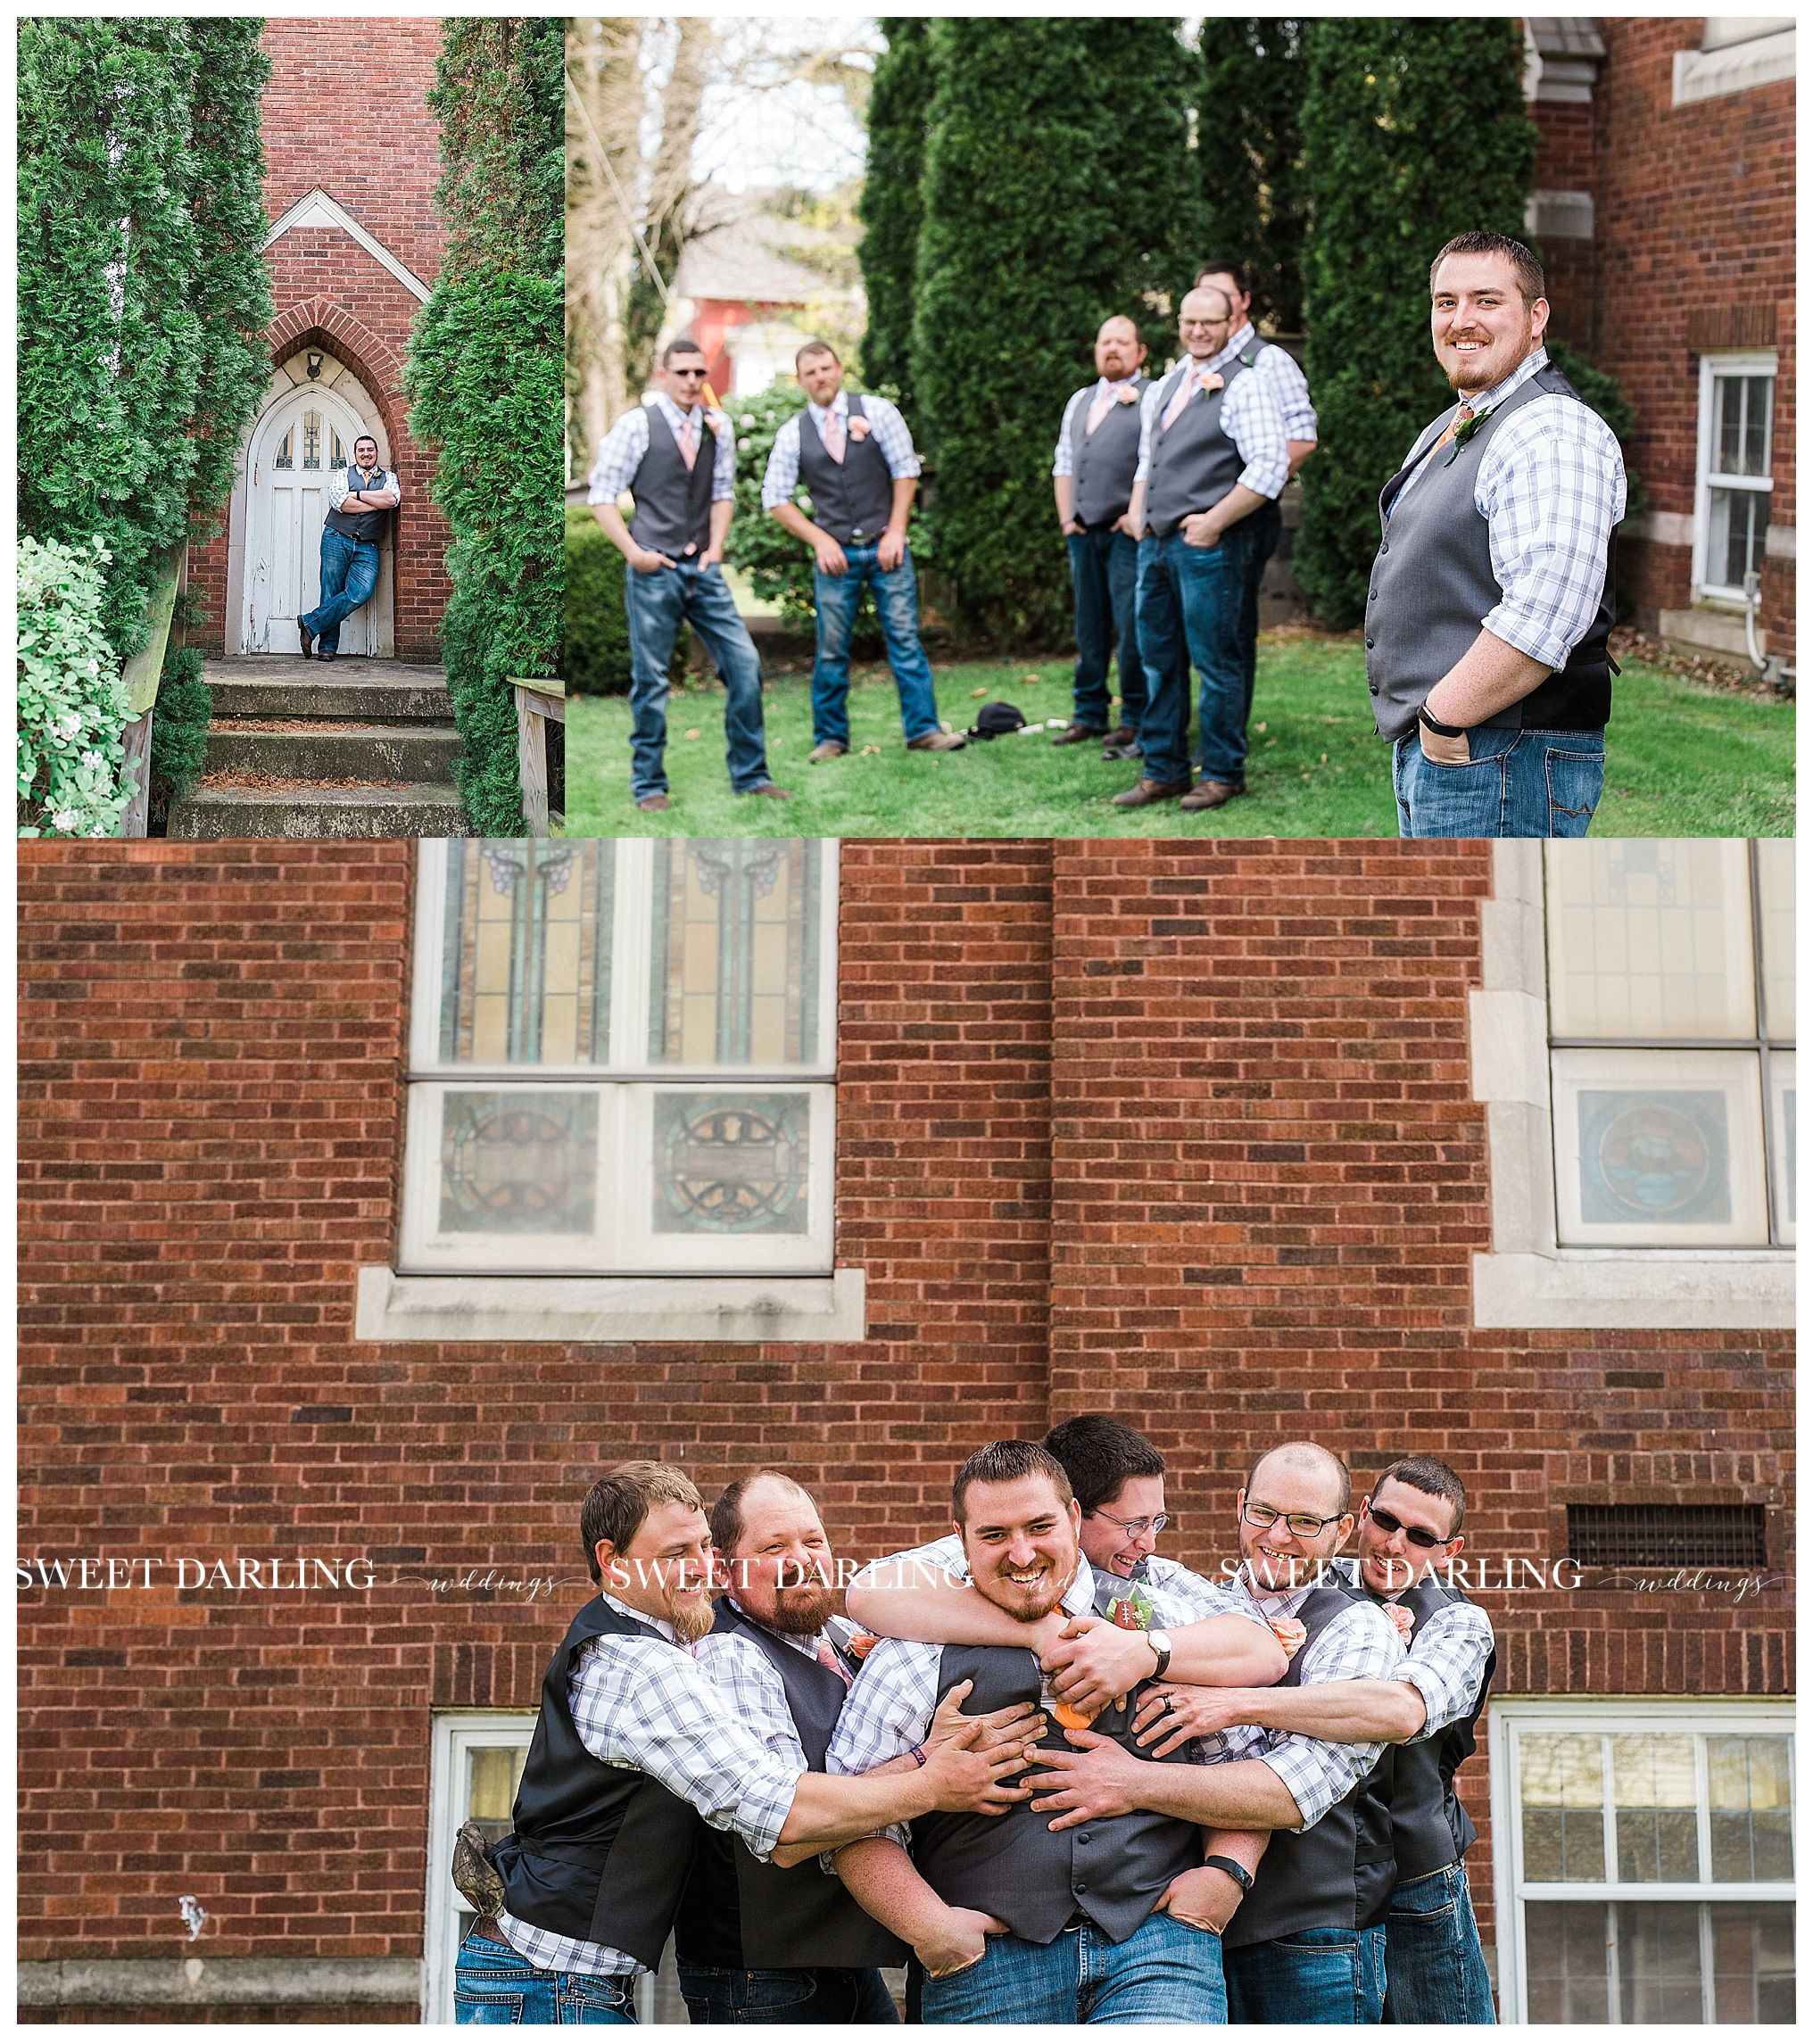 arcoloa-illinois-coles-county-wedding-photography-sweet-darling-weddings-photographer_0950.jpg